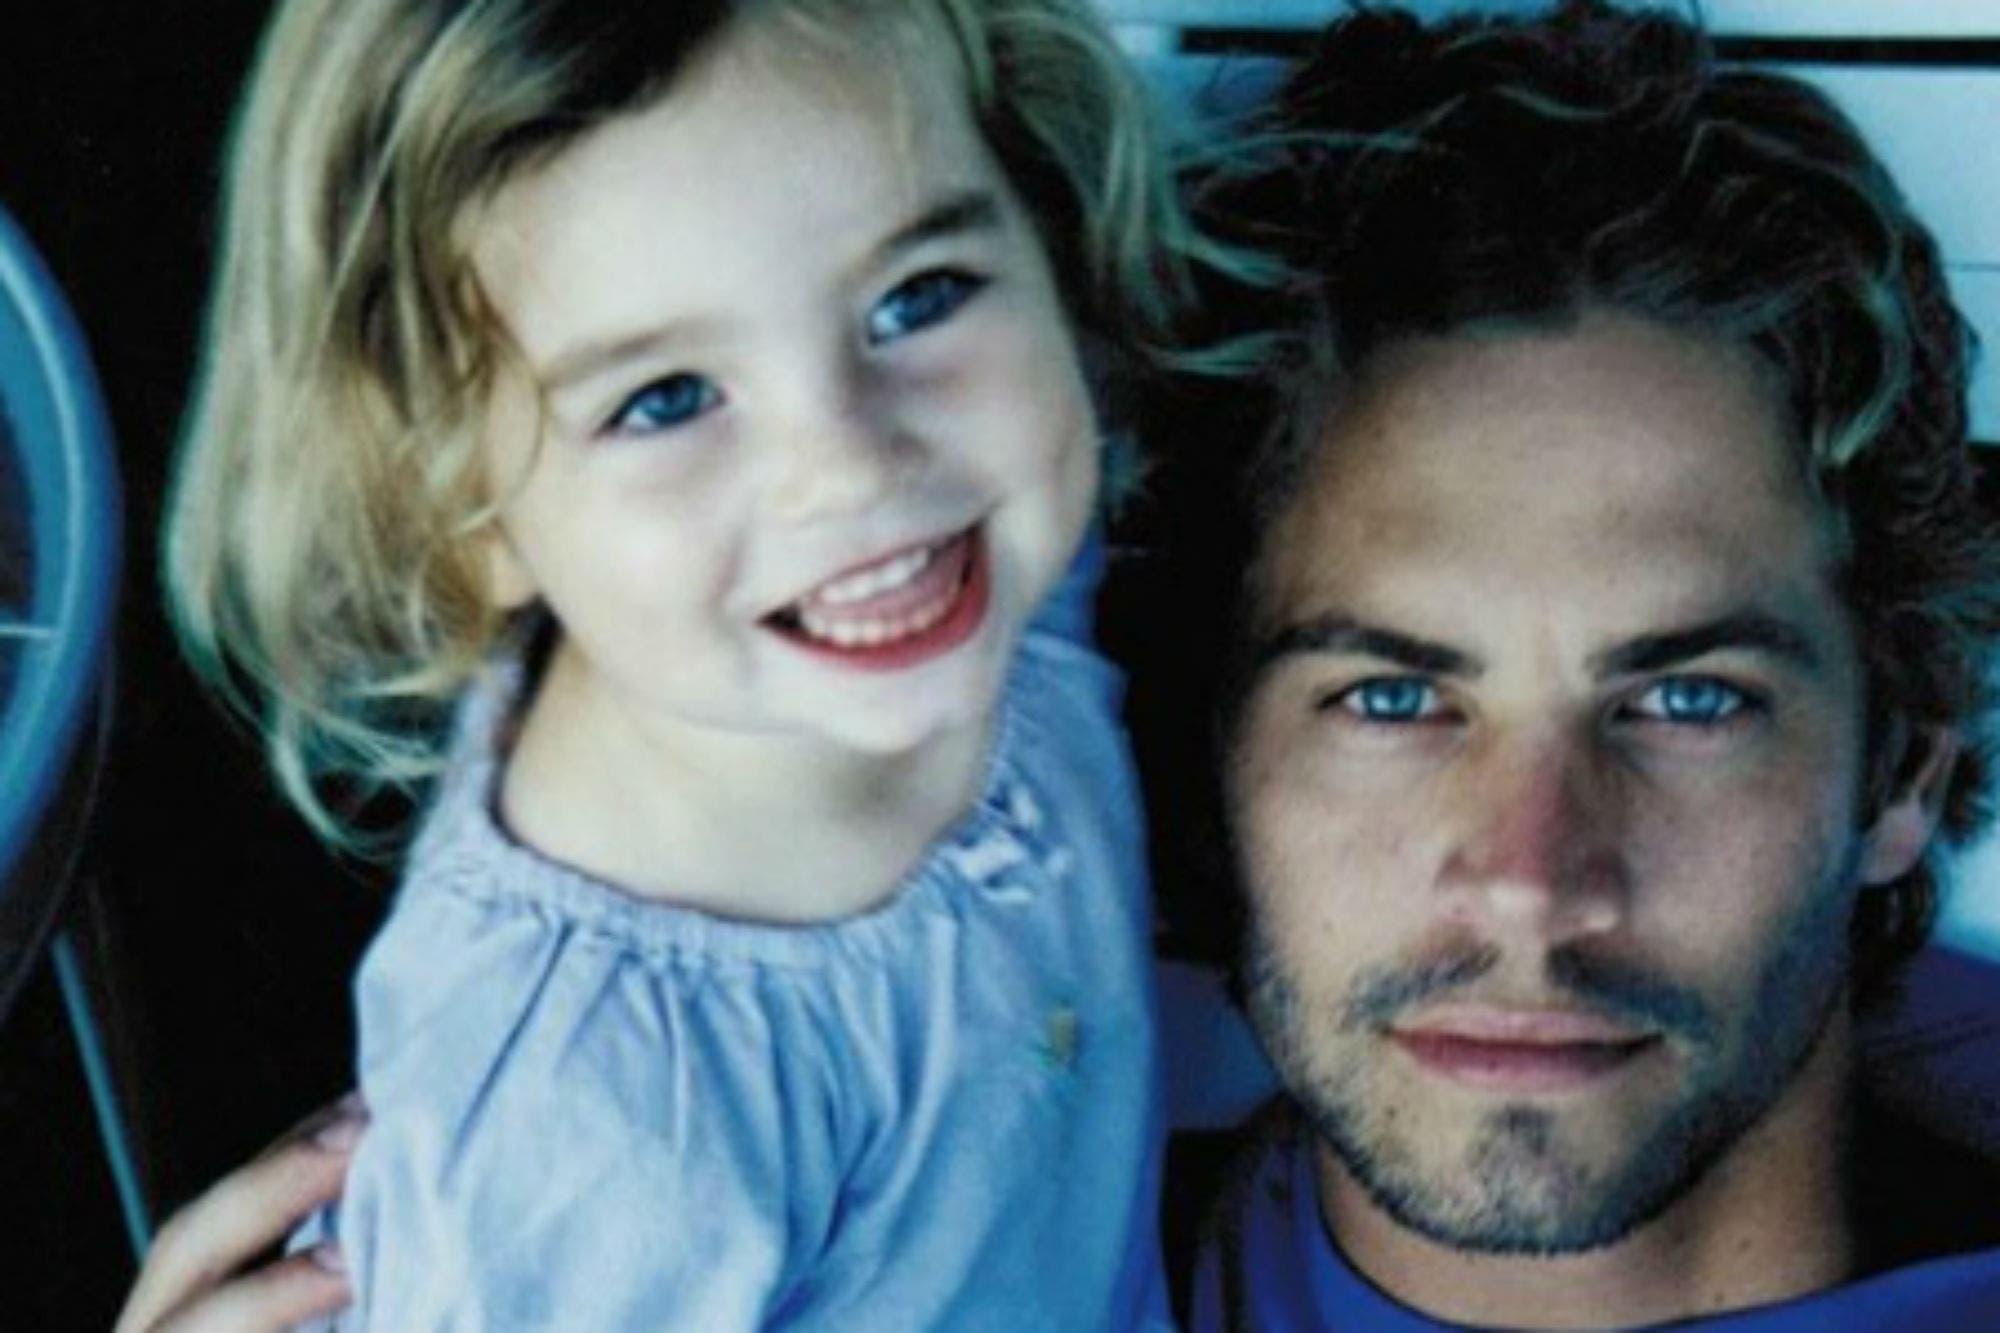 La hija de Paul Walker compartió un video inédito del actor